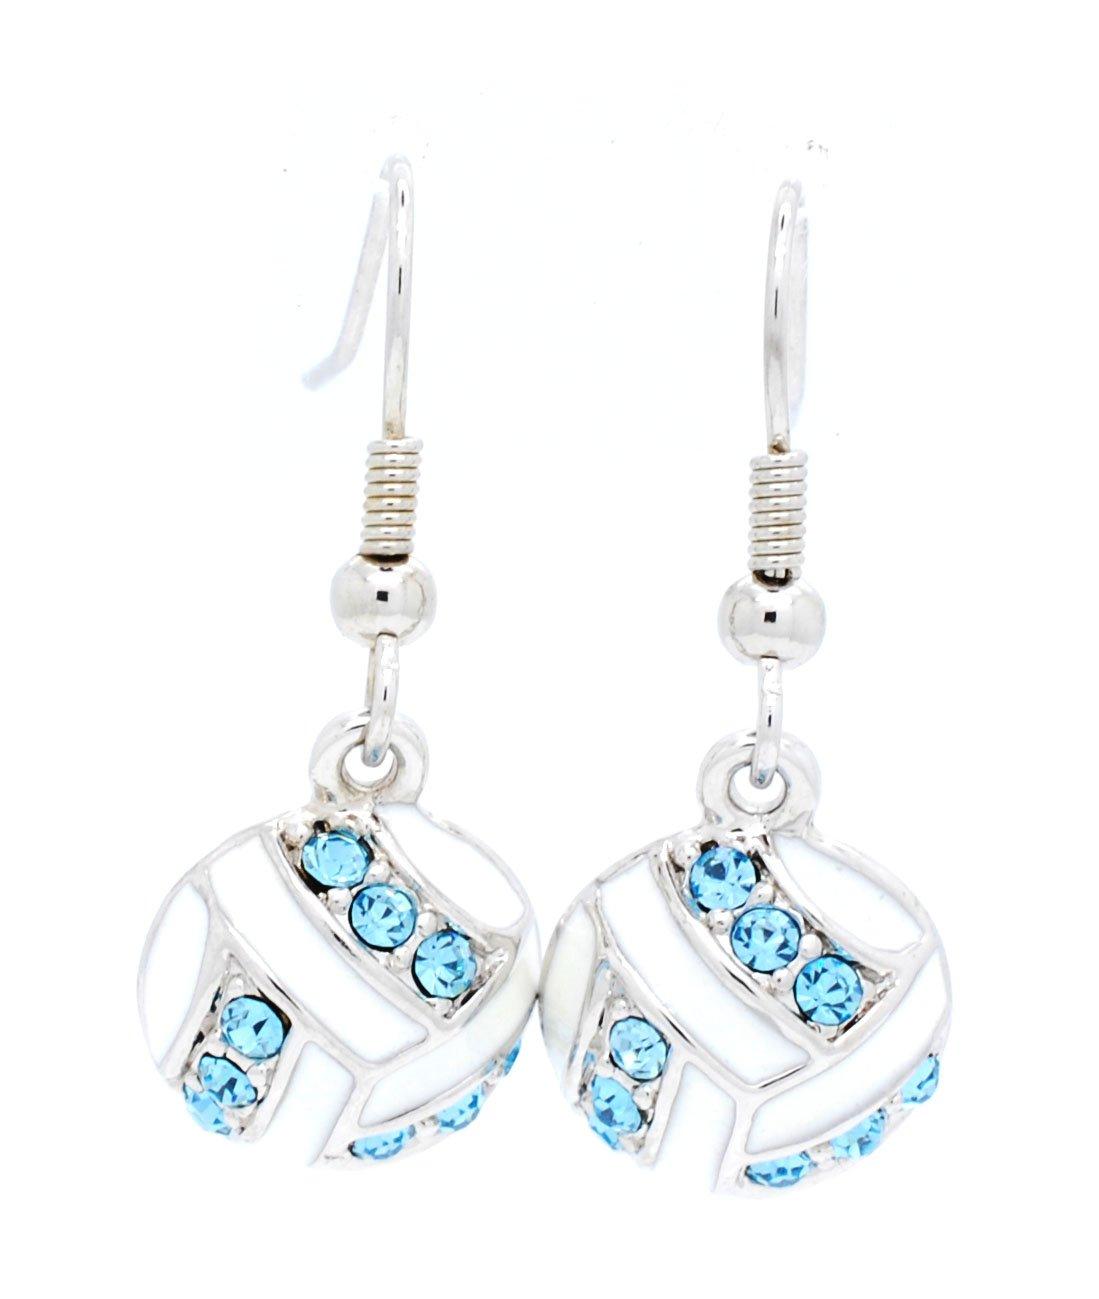 Violet Victoria /& Fan Star Volleyball Earrings Dangle Volleyball Earrings